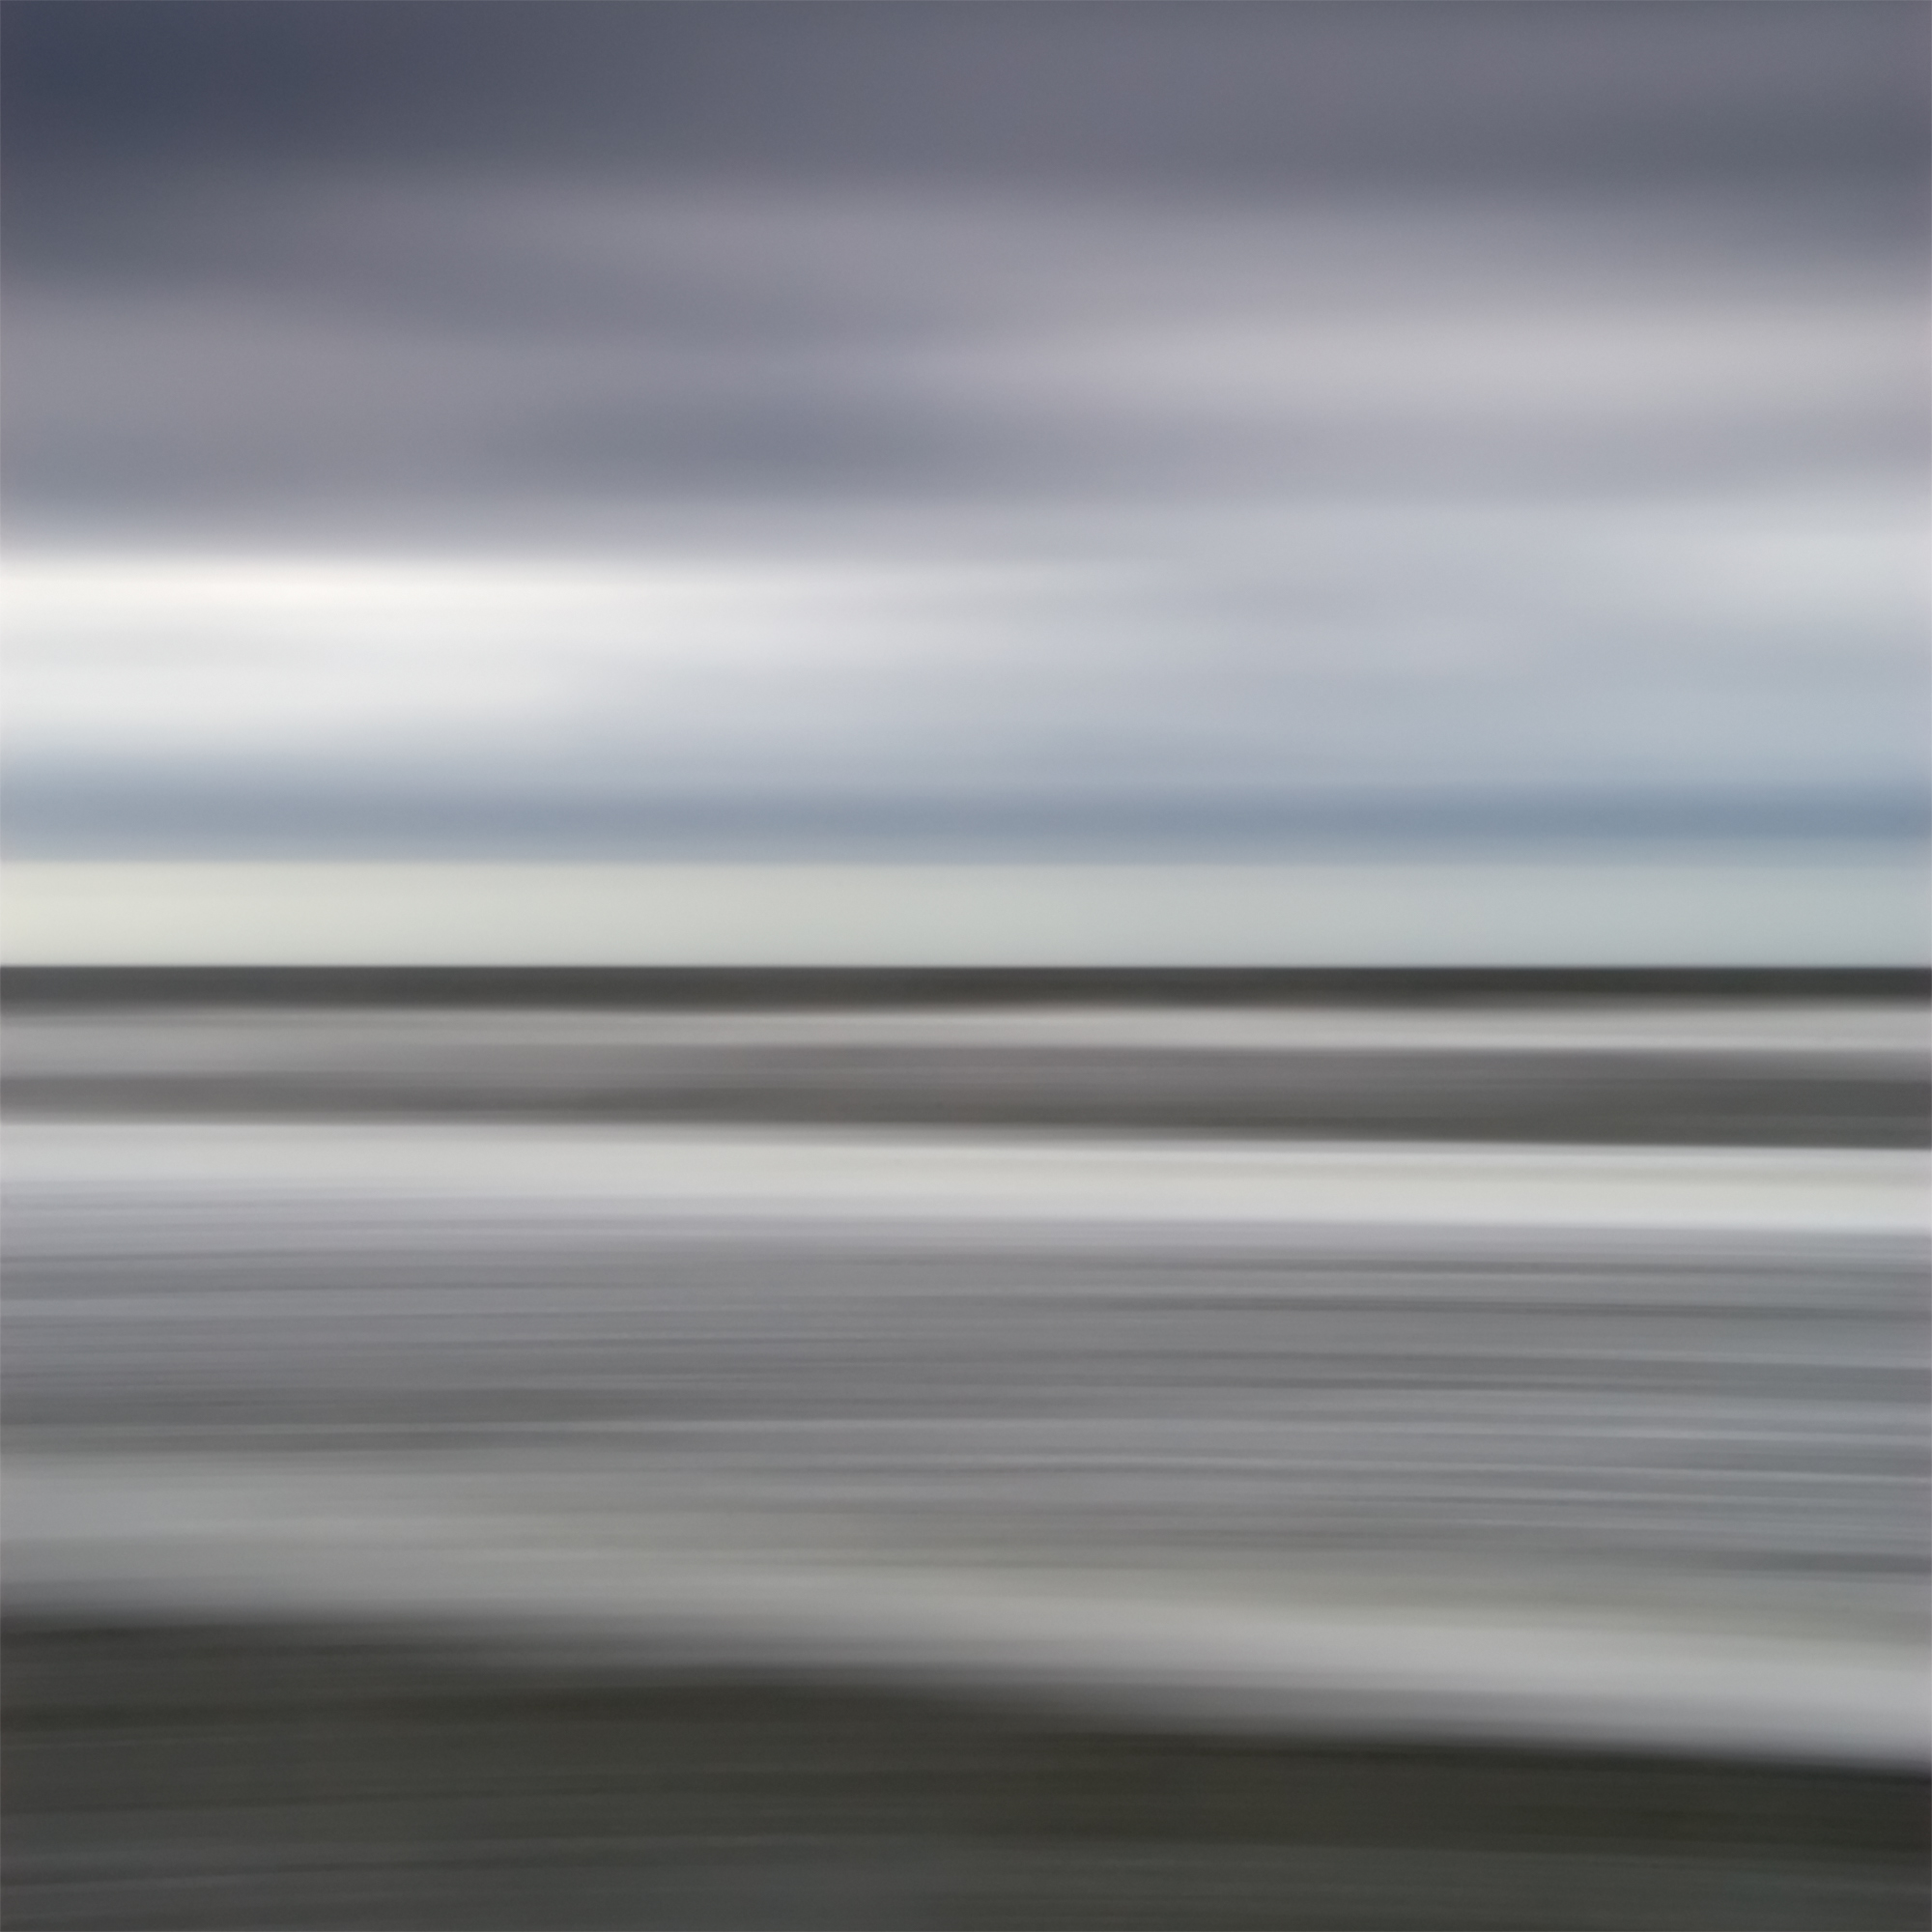 "Folly Beach '26627' 40x40"" Edition 1/5 on Plexi in Black Frame"